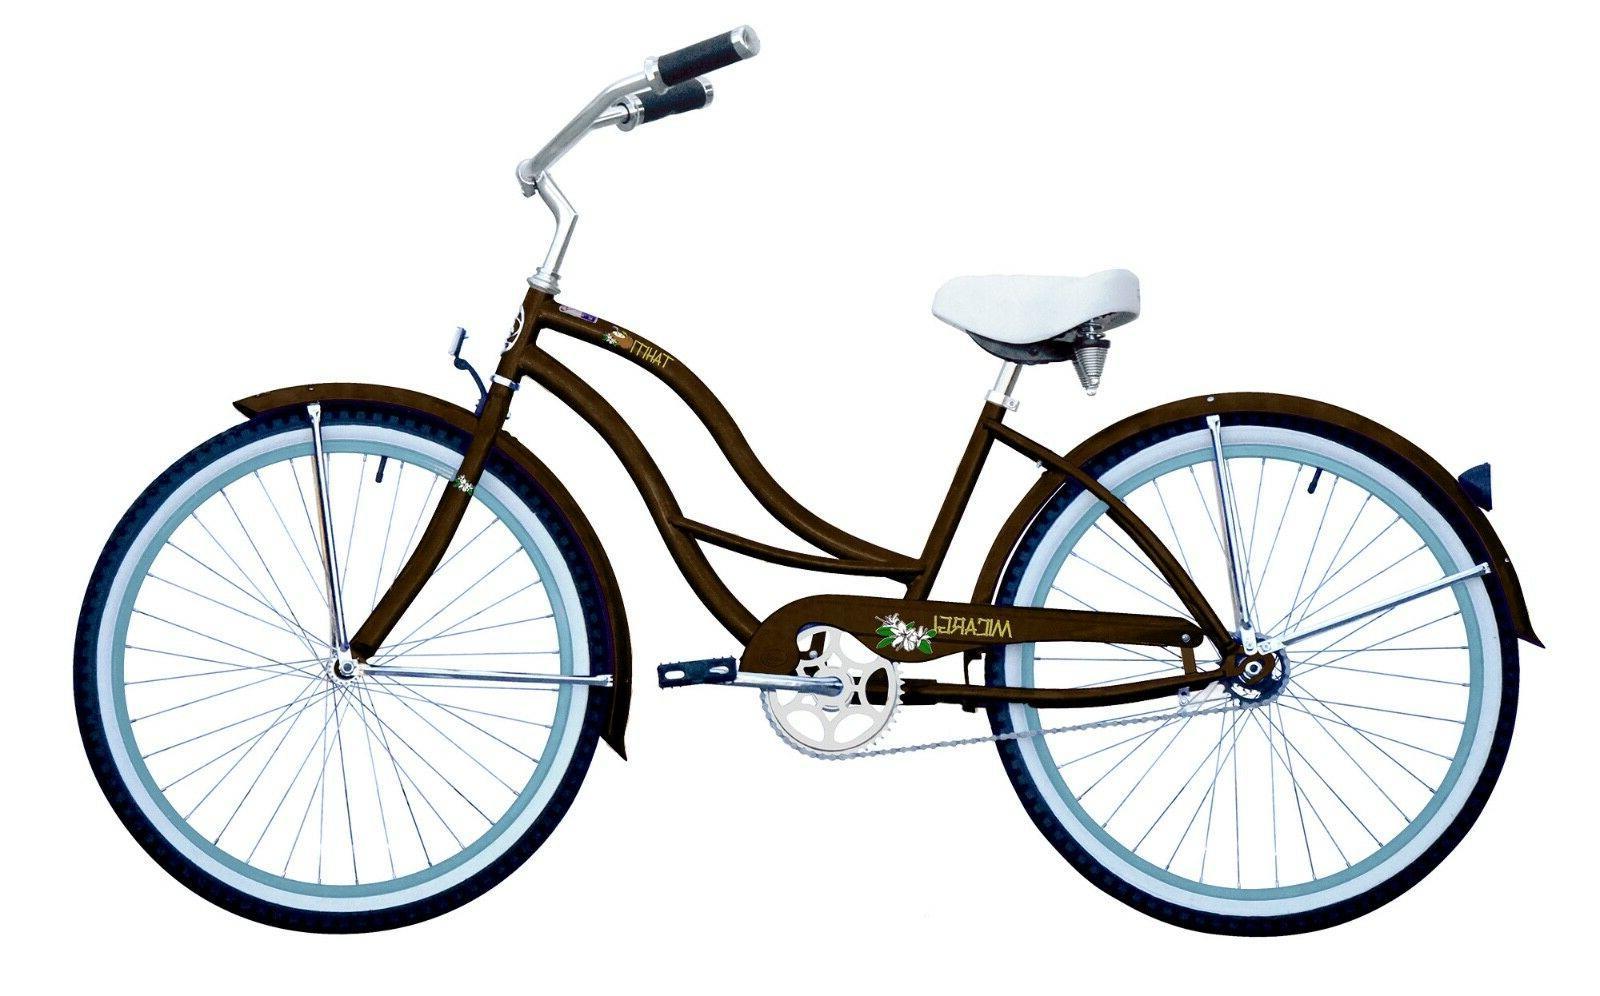 NEW Beach Cruiser Micargi Tahitti One Bike